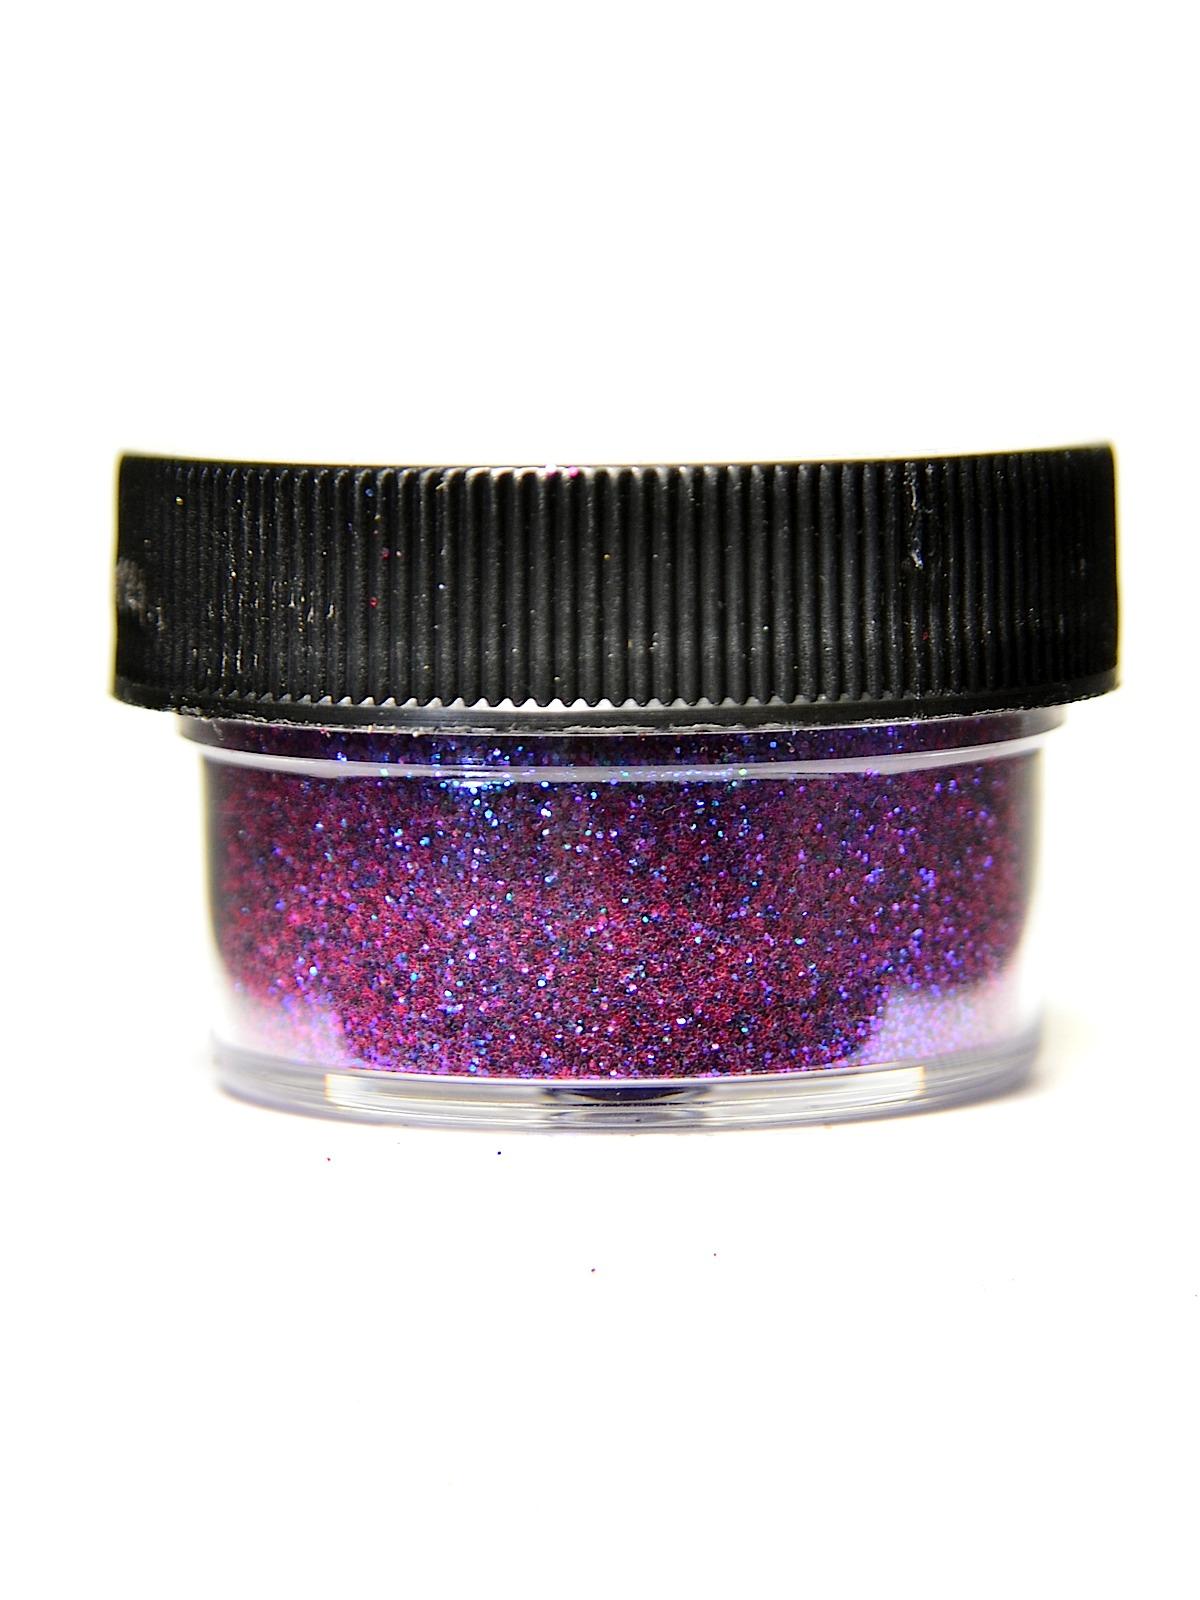 Ultrafine Transparent Glitter Gelina 1 2 Oz. Jar